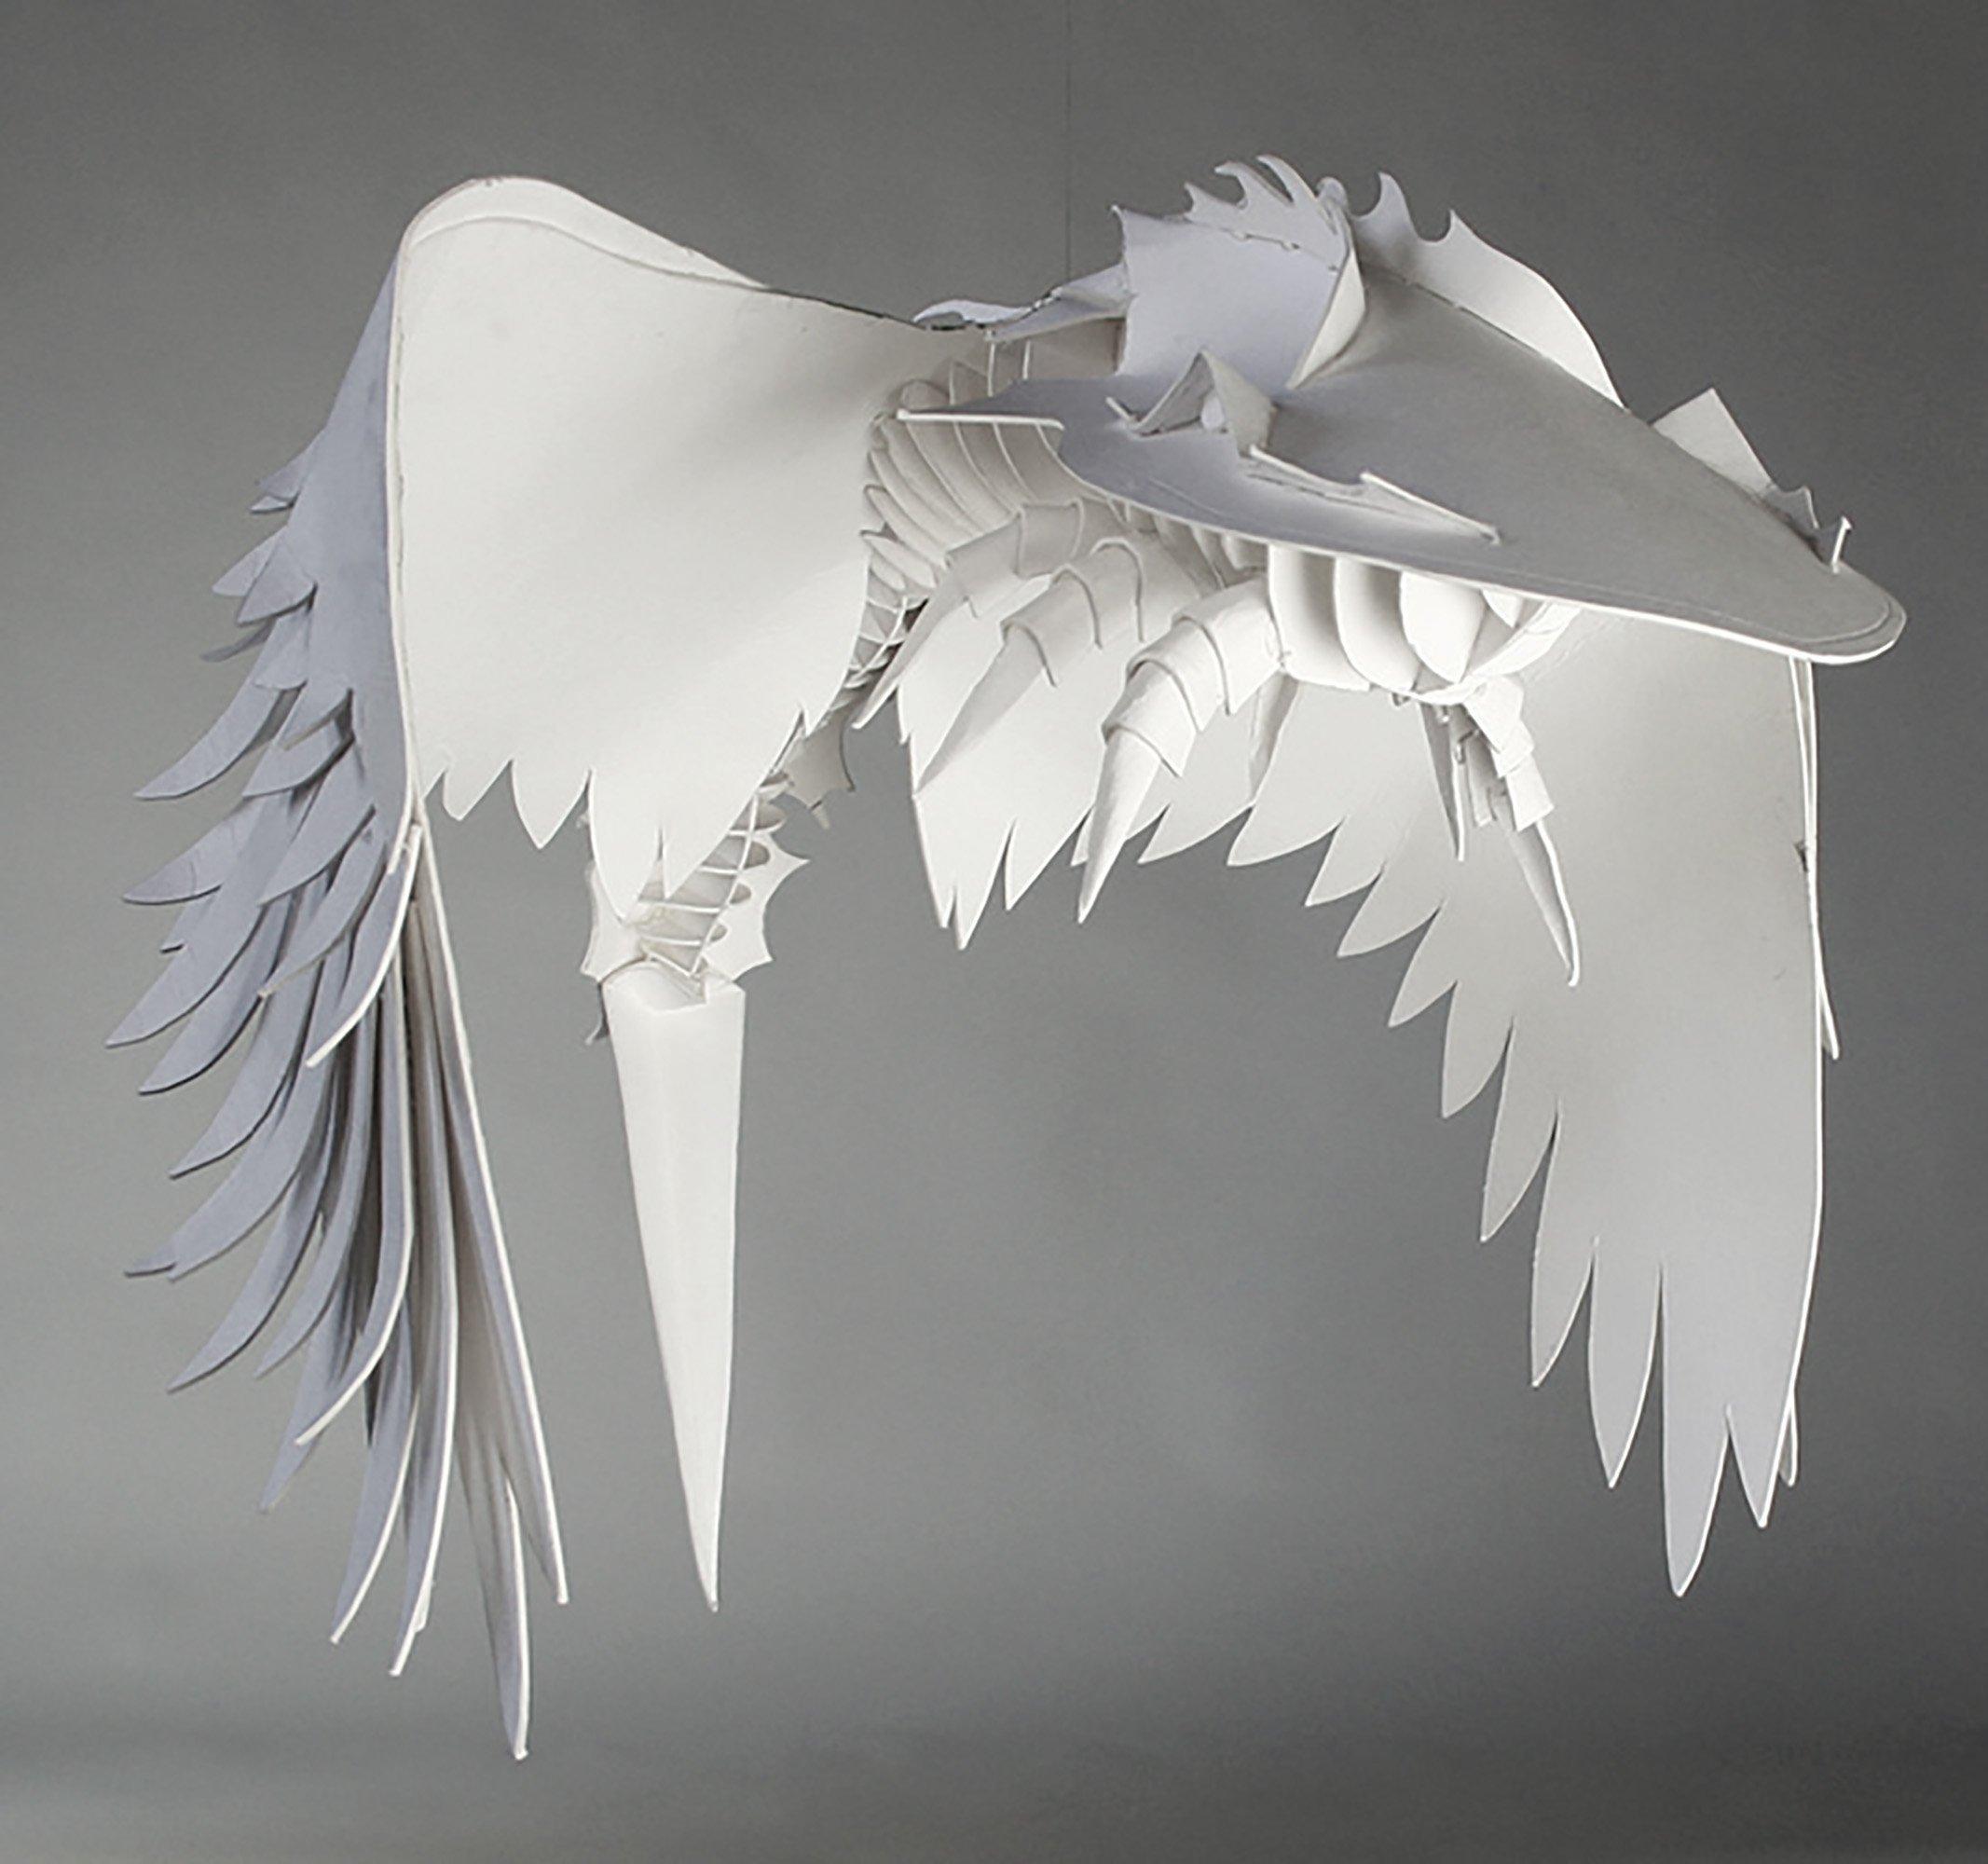 Bird 3D taskboard sculpture